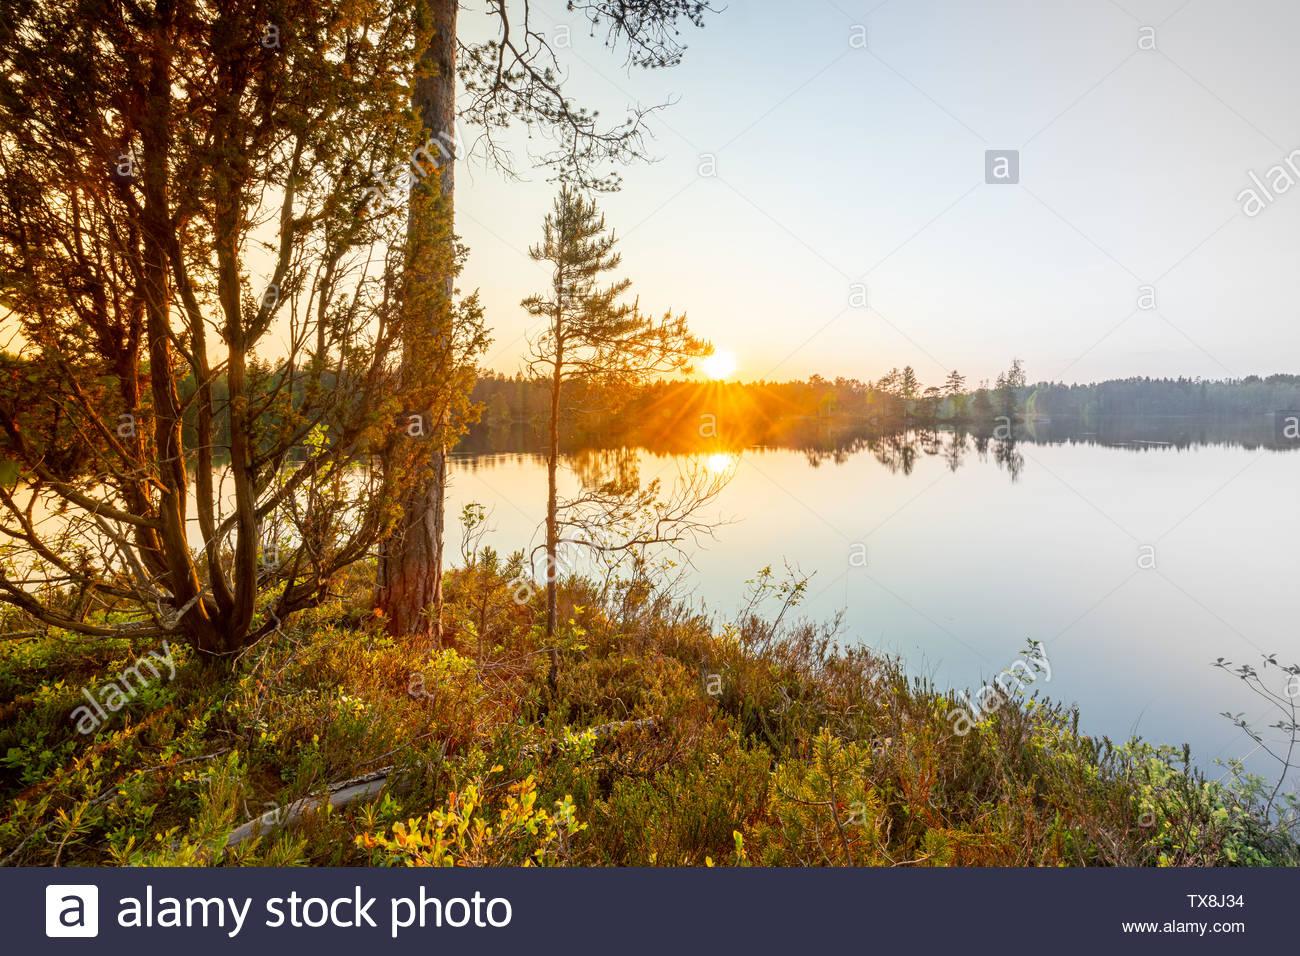 Lake sunset finland - Stock Image